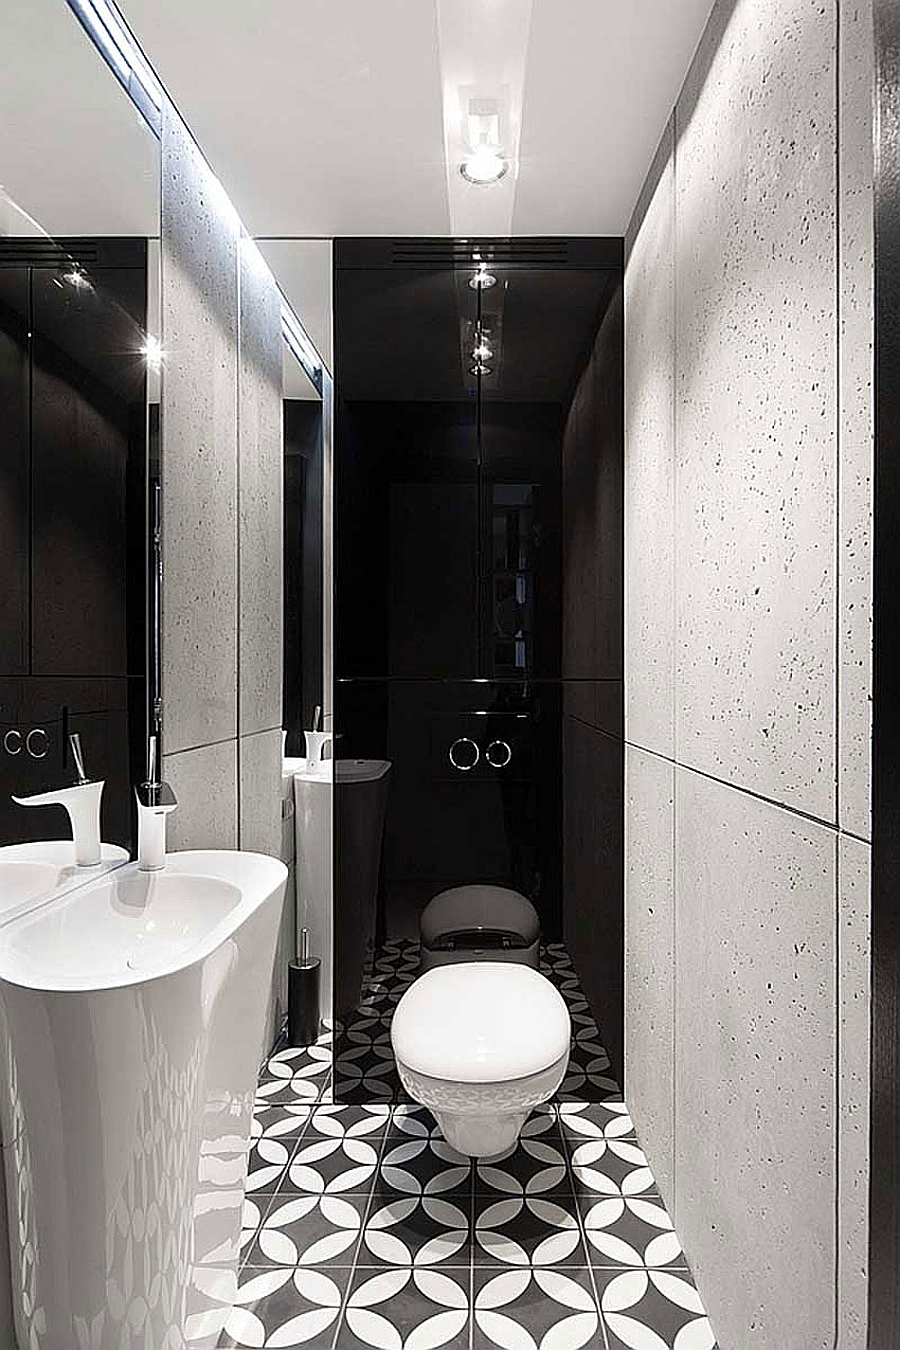 Posh Monochromatic Apartment by Widawscy Studio Architektury on Monochromatic Bathroom Ideas  id=63397